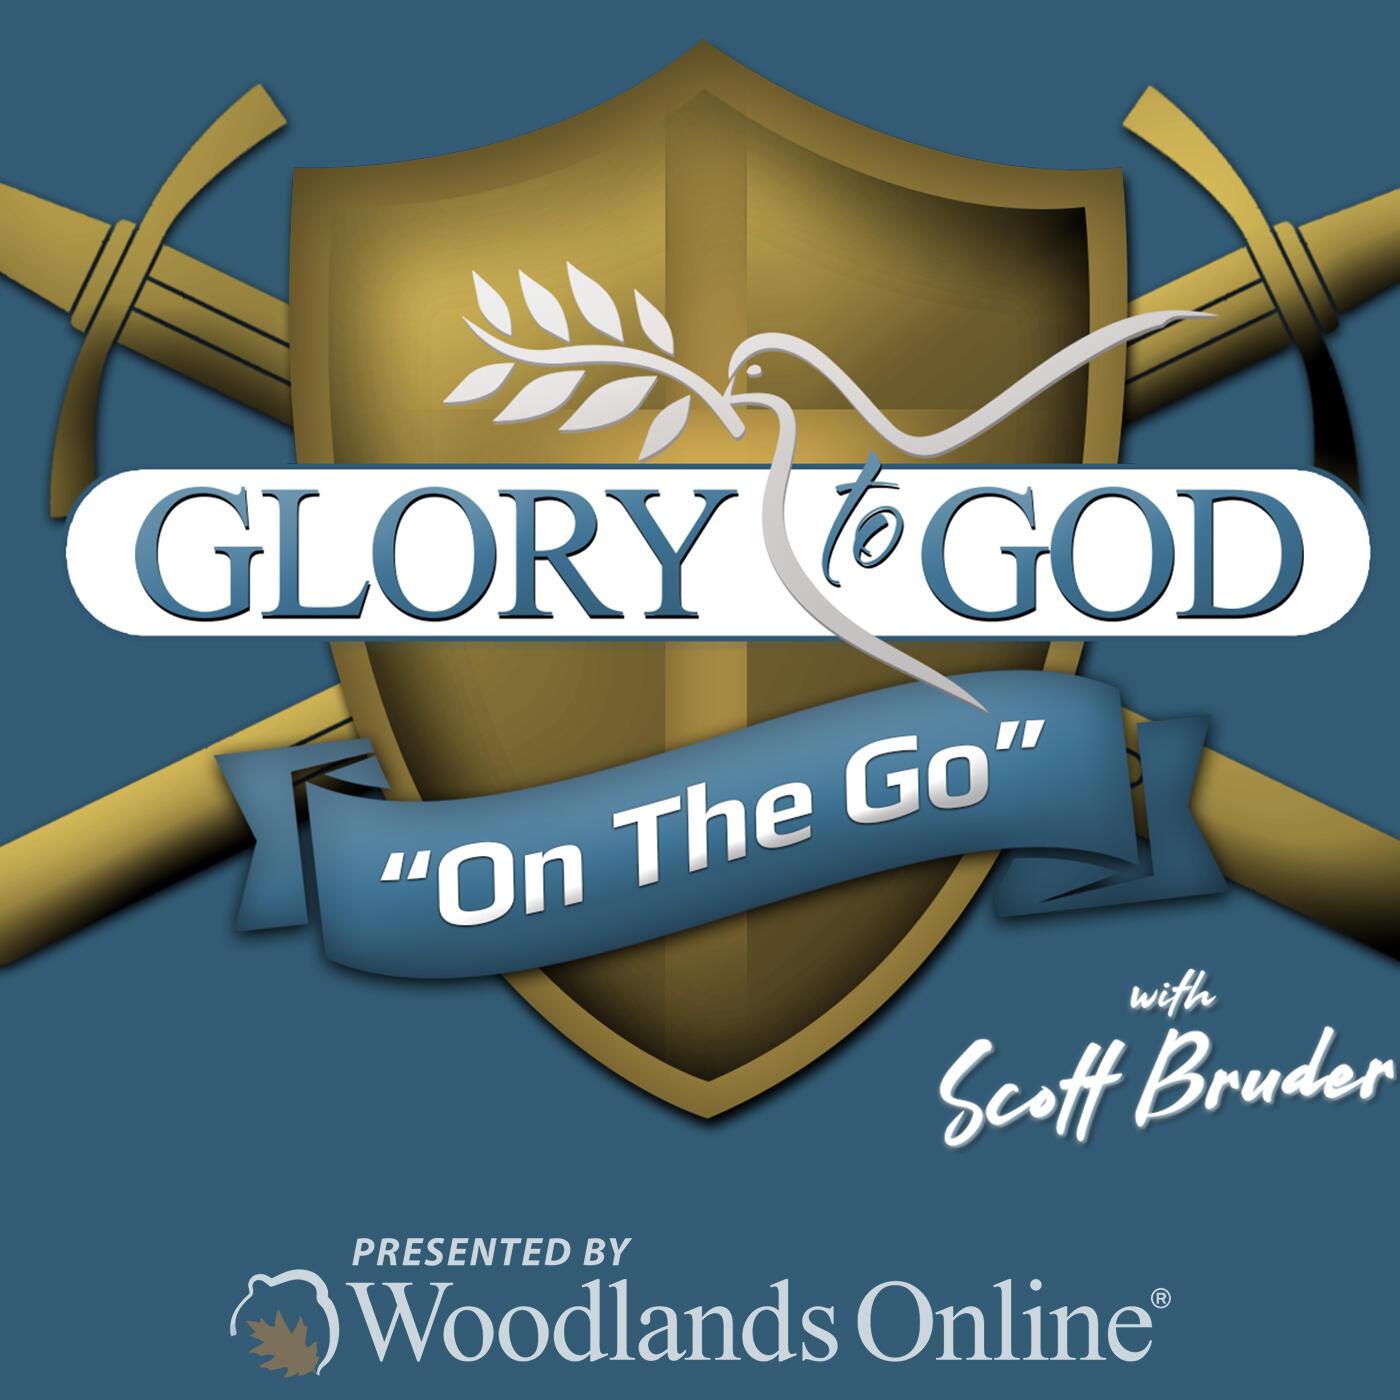 Glory to God - On The Go